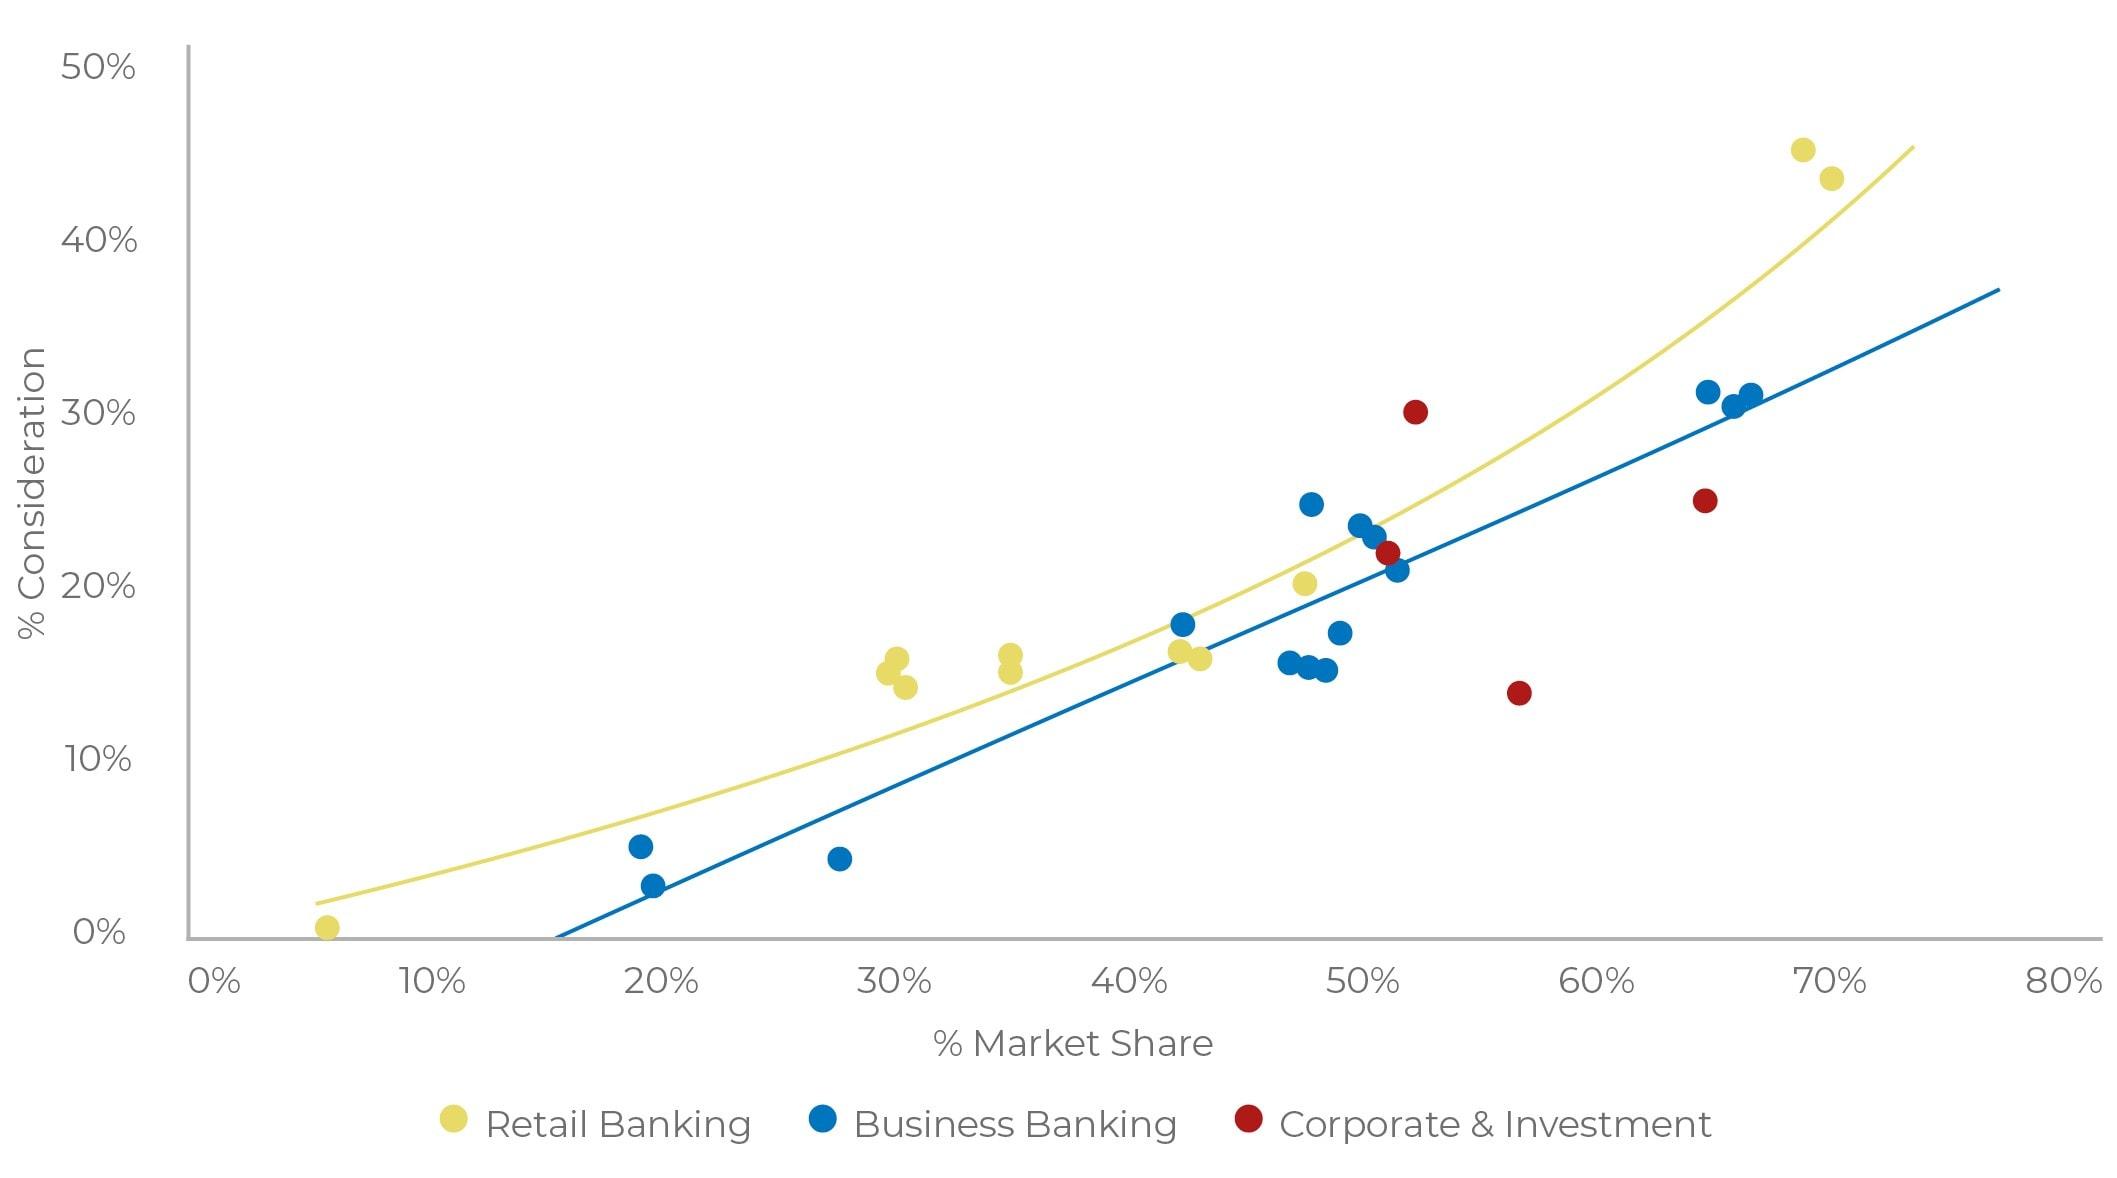 Sponsorship Evaluation: Consideration vs Usage